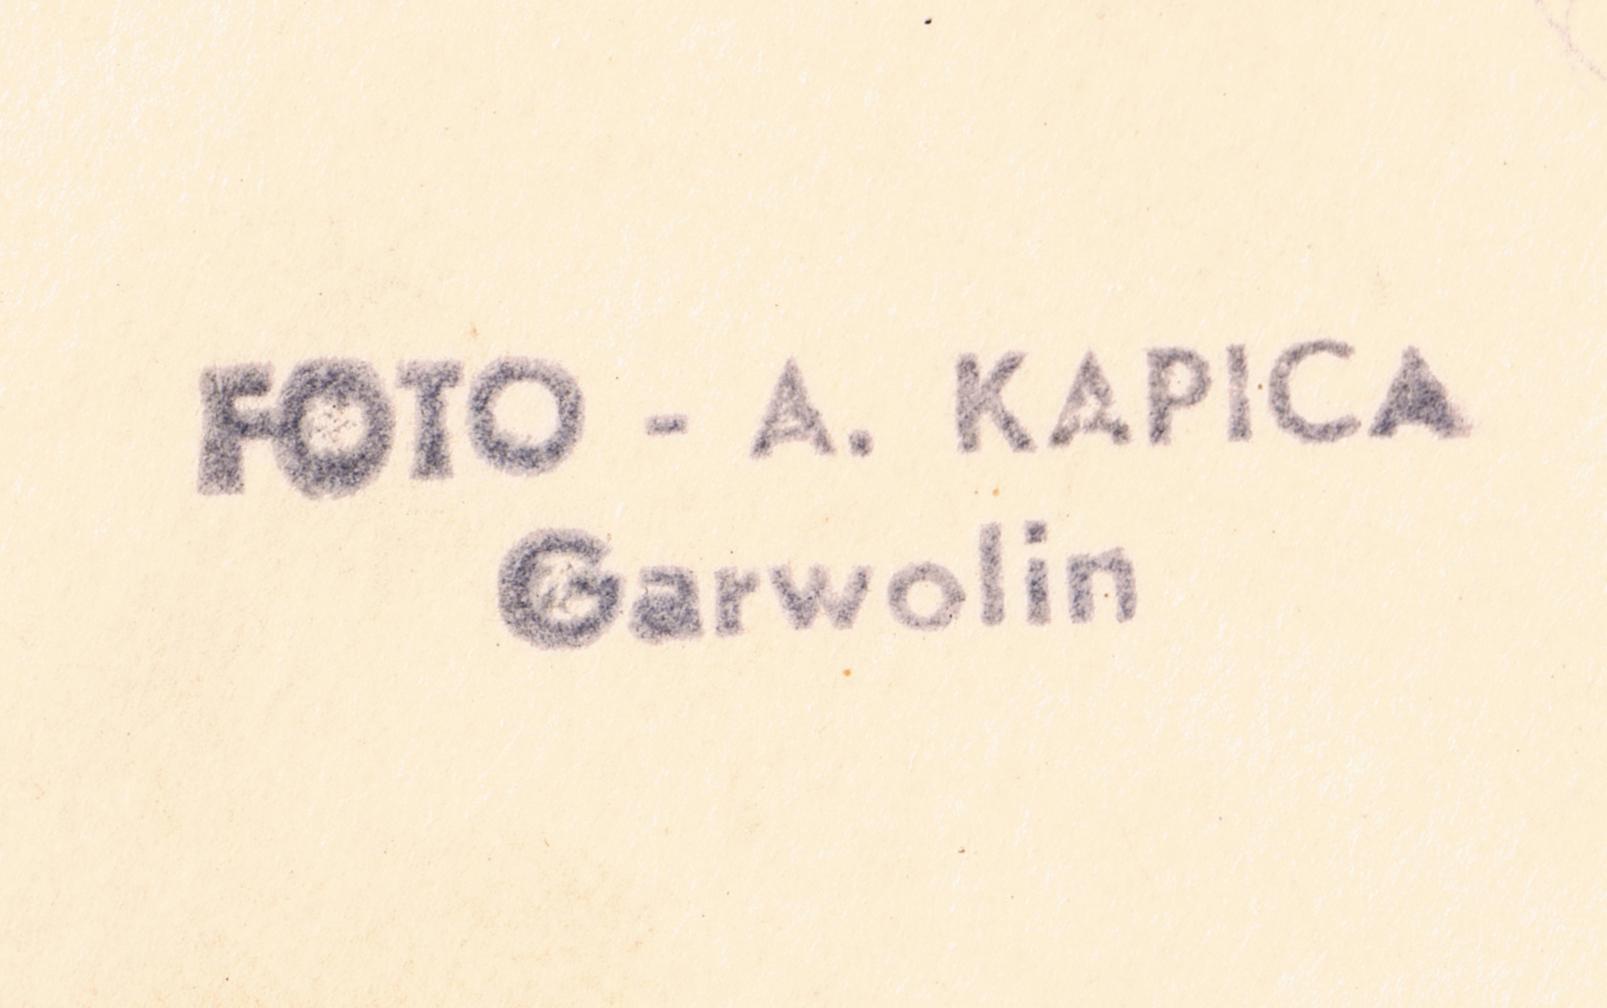 fotograf_a_kapica_garwolin_org